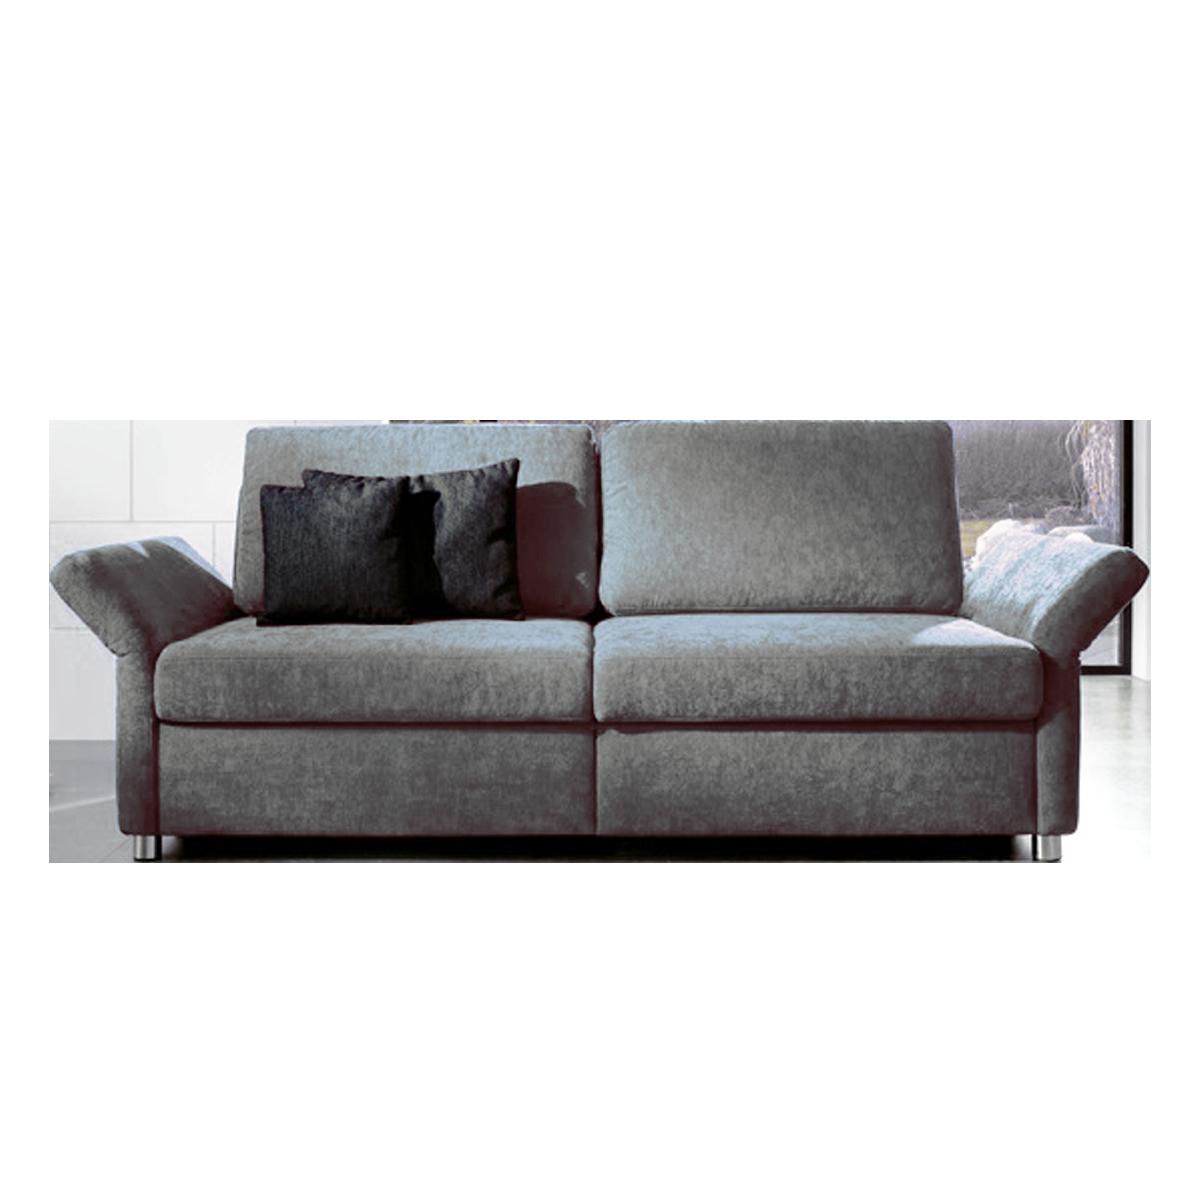 Full Size of Sofa Allround Bezug Grau Metallfe Chrom Einzelsofa 2 Sitzer Modern Leder Vitra Kolonialstil W Schillig Canape Ligne Roset Spannbezug Big Mit Schlaffunktion 2er Sofa Poco Big Sofa